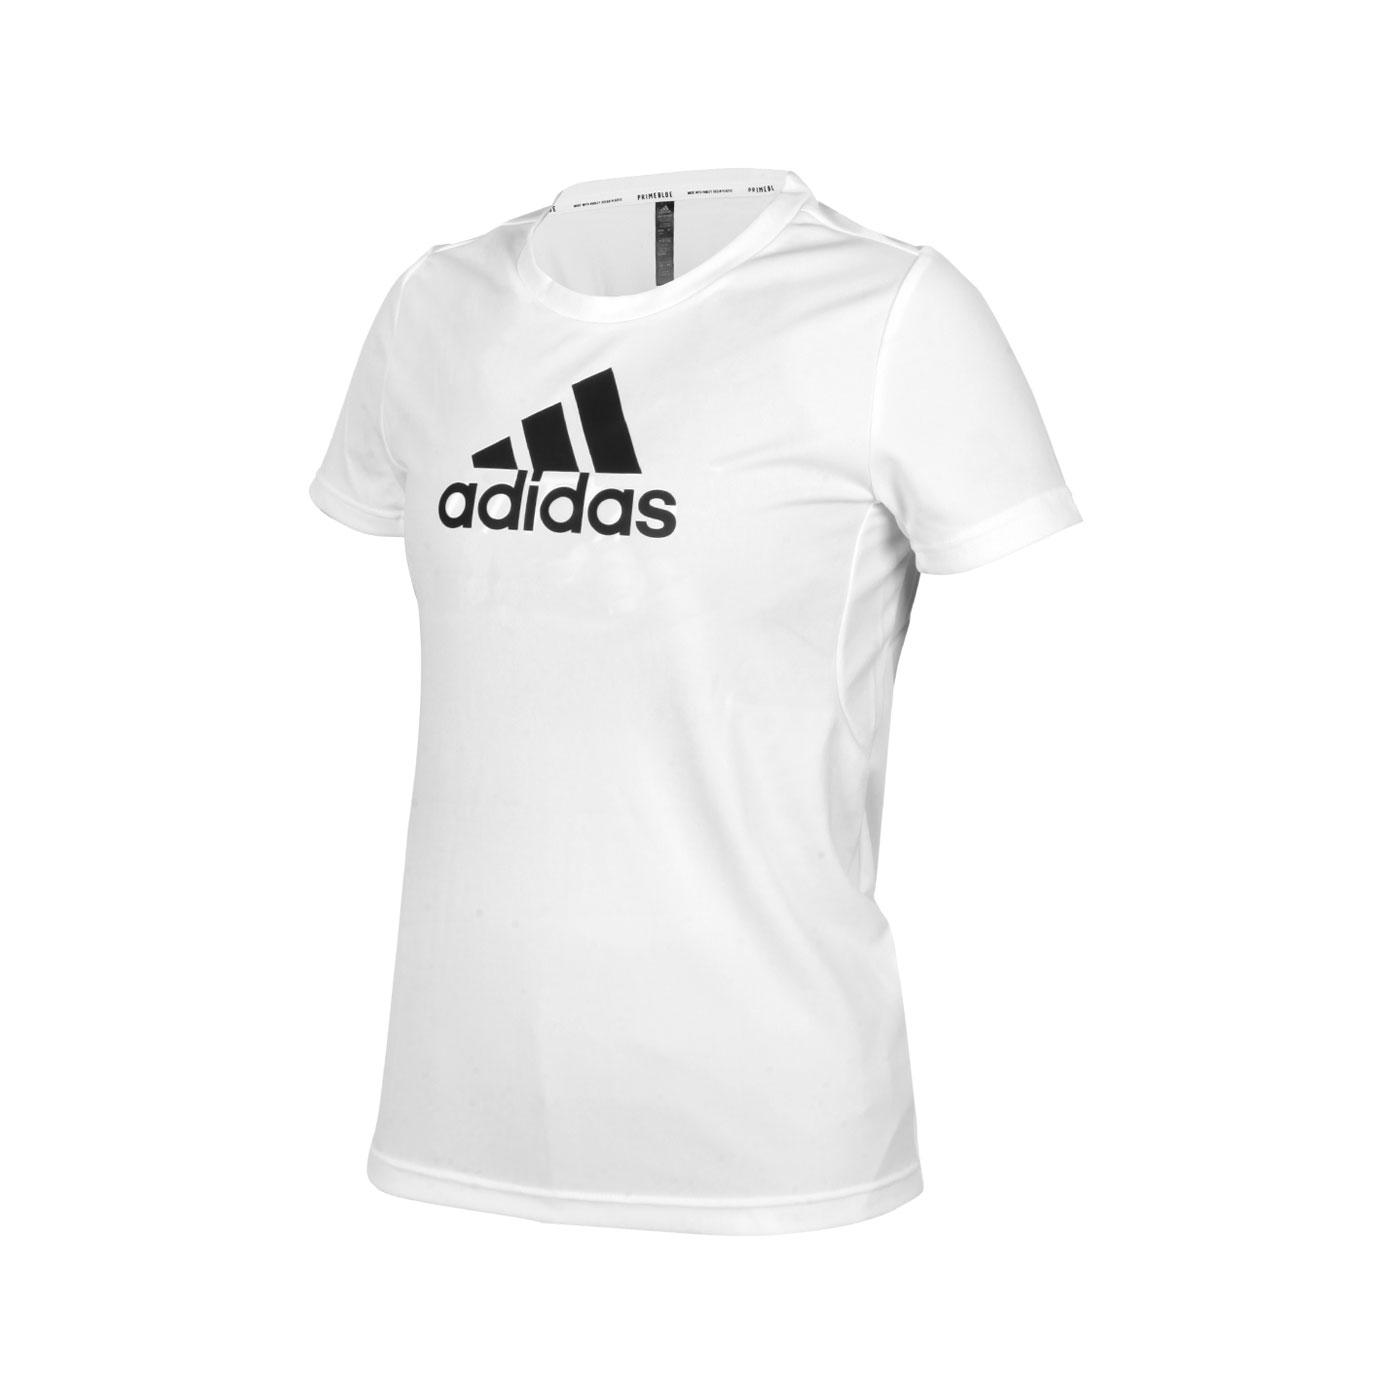 ADIDAS 女款短袖T恤 GL3821 - 白黑